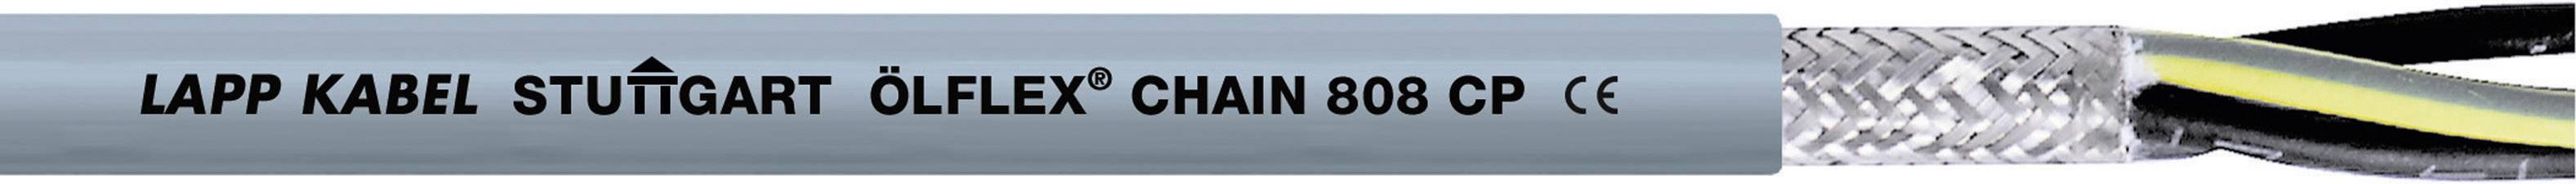 Žíla kabelu LappKabel ÖLFLEX CHAIN 808 CP 2X0,5 (1027751), 2x 0,5 mm², polyurethan, Ø 5,8 mm, stíněný, 1 m, še